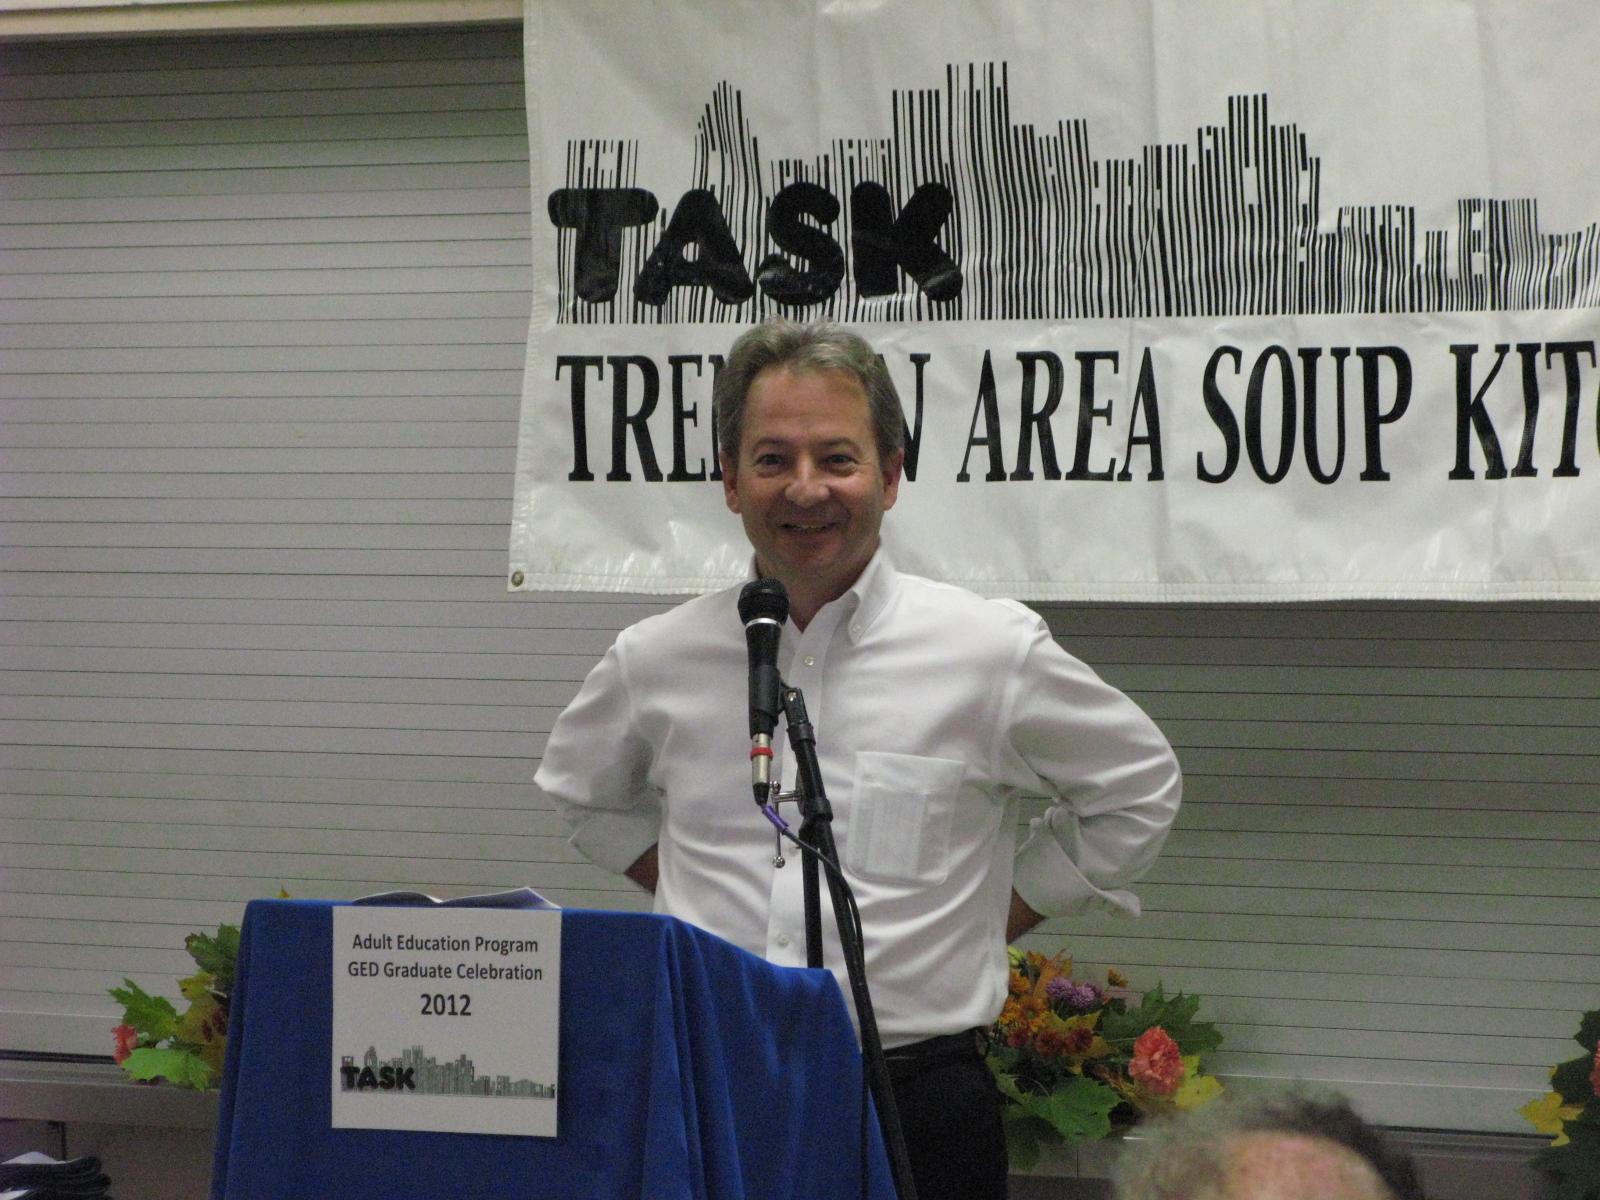 009-TASK 2012 GED Graduate Celebration (27).JPG